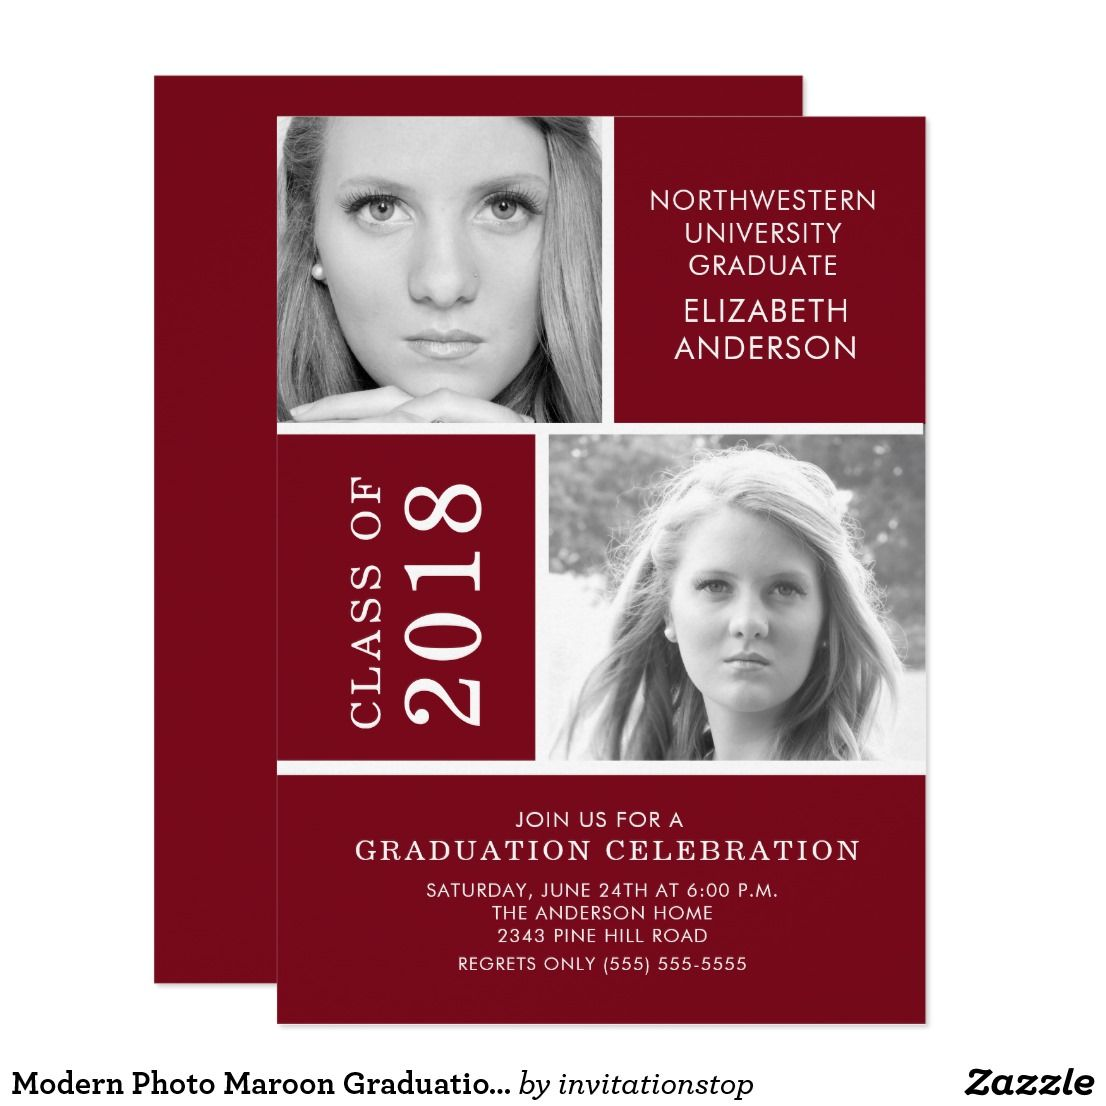 Modern Photo Maroon Graduation Invitation | Graduation Invitations ...